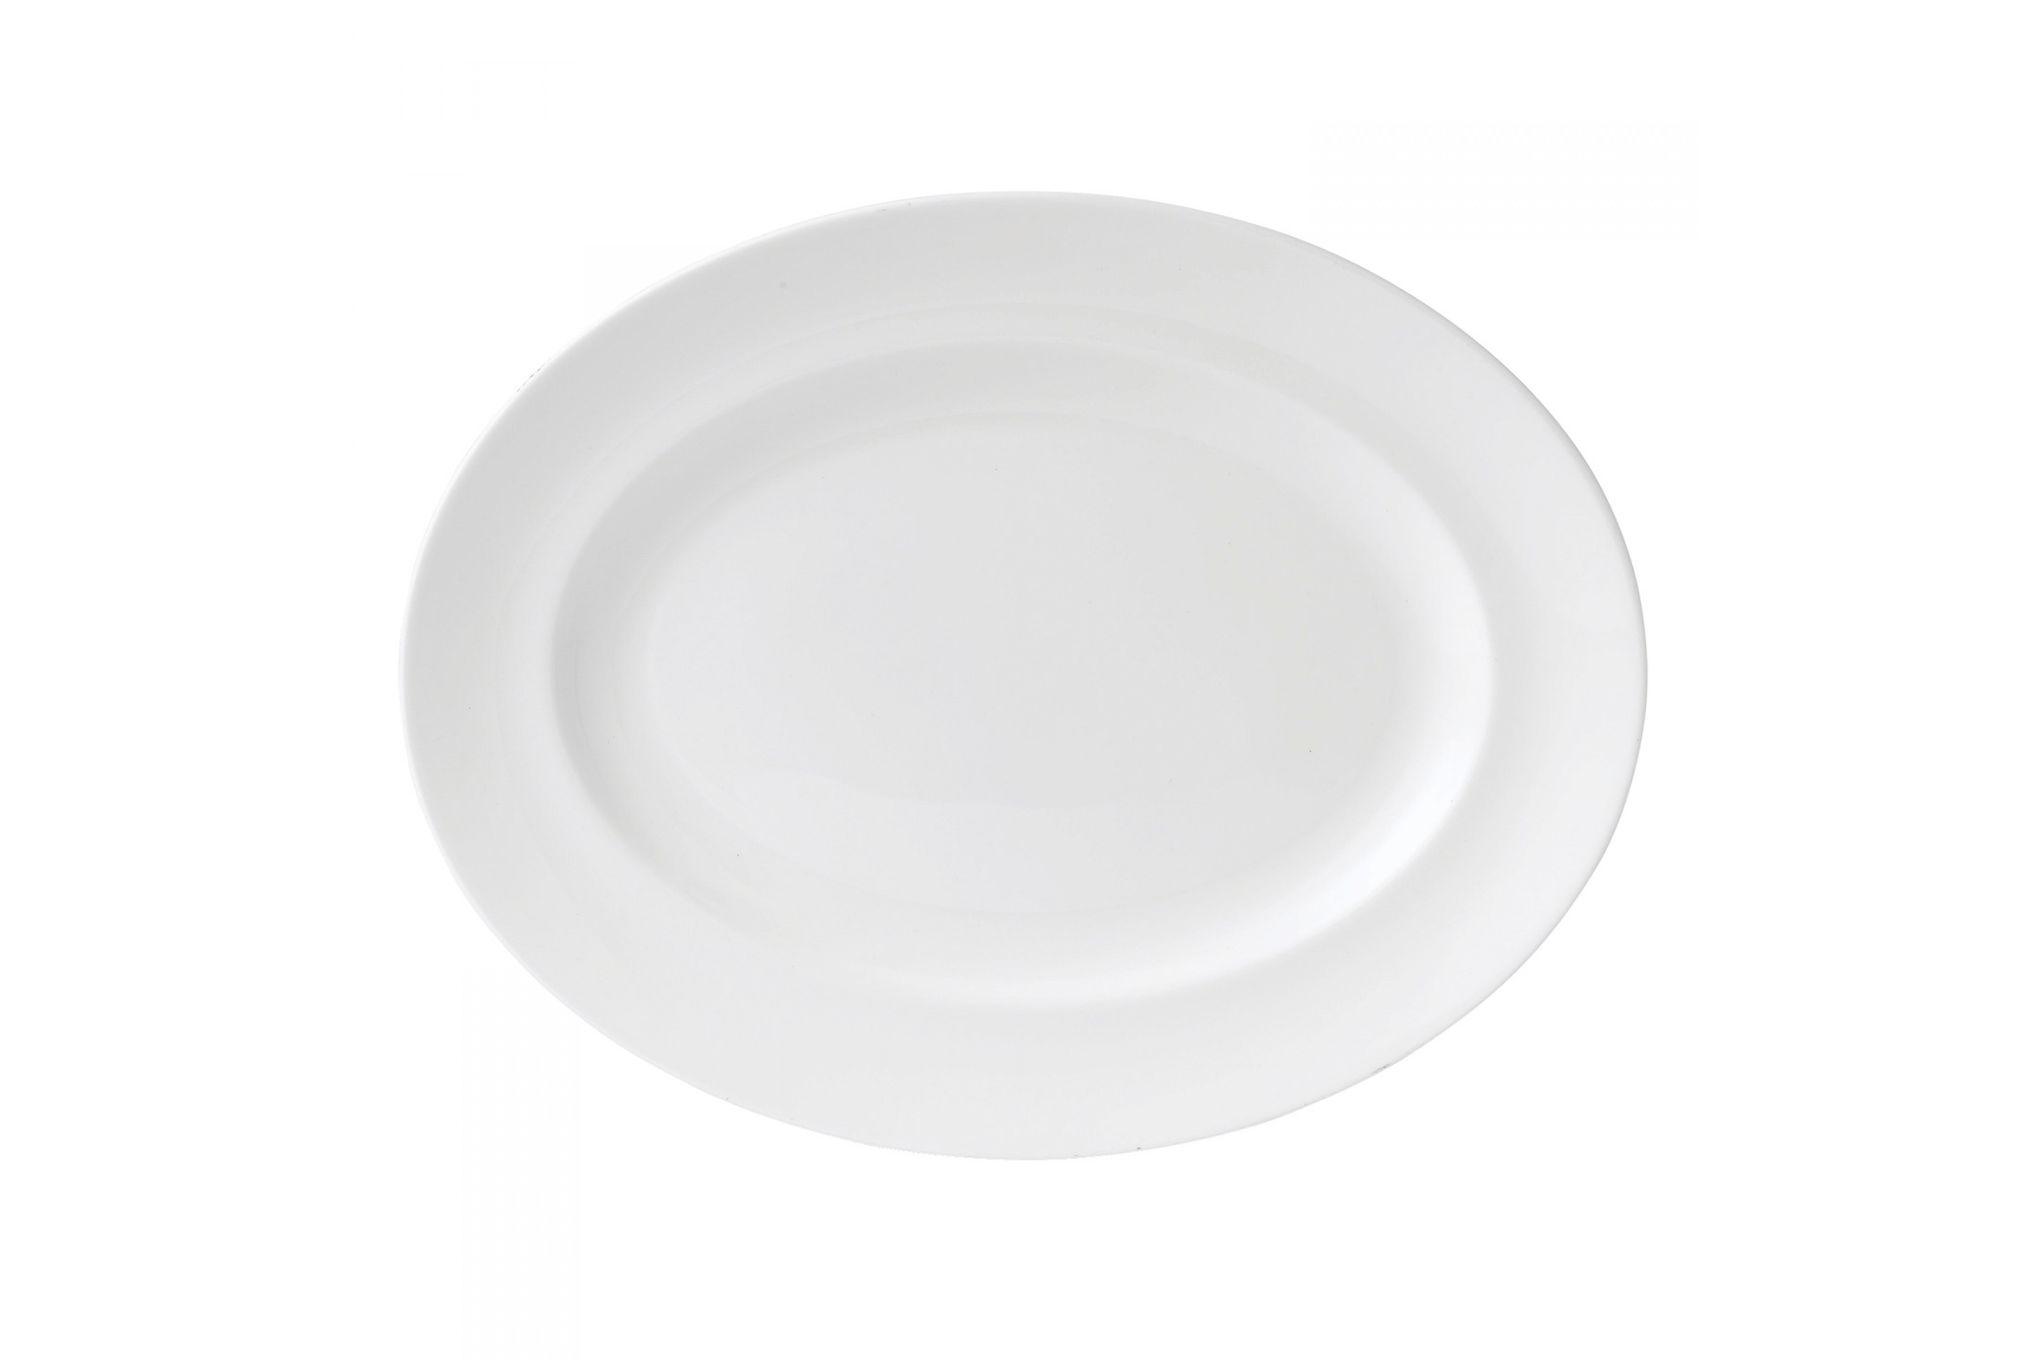 Wedgwood Wedgwood White Oval Plate / Platter 35cm thumb 2